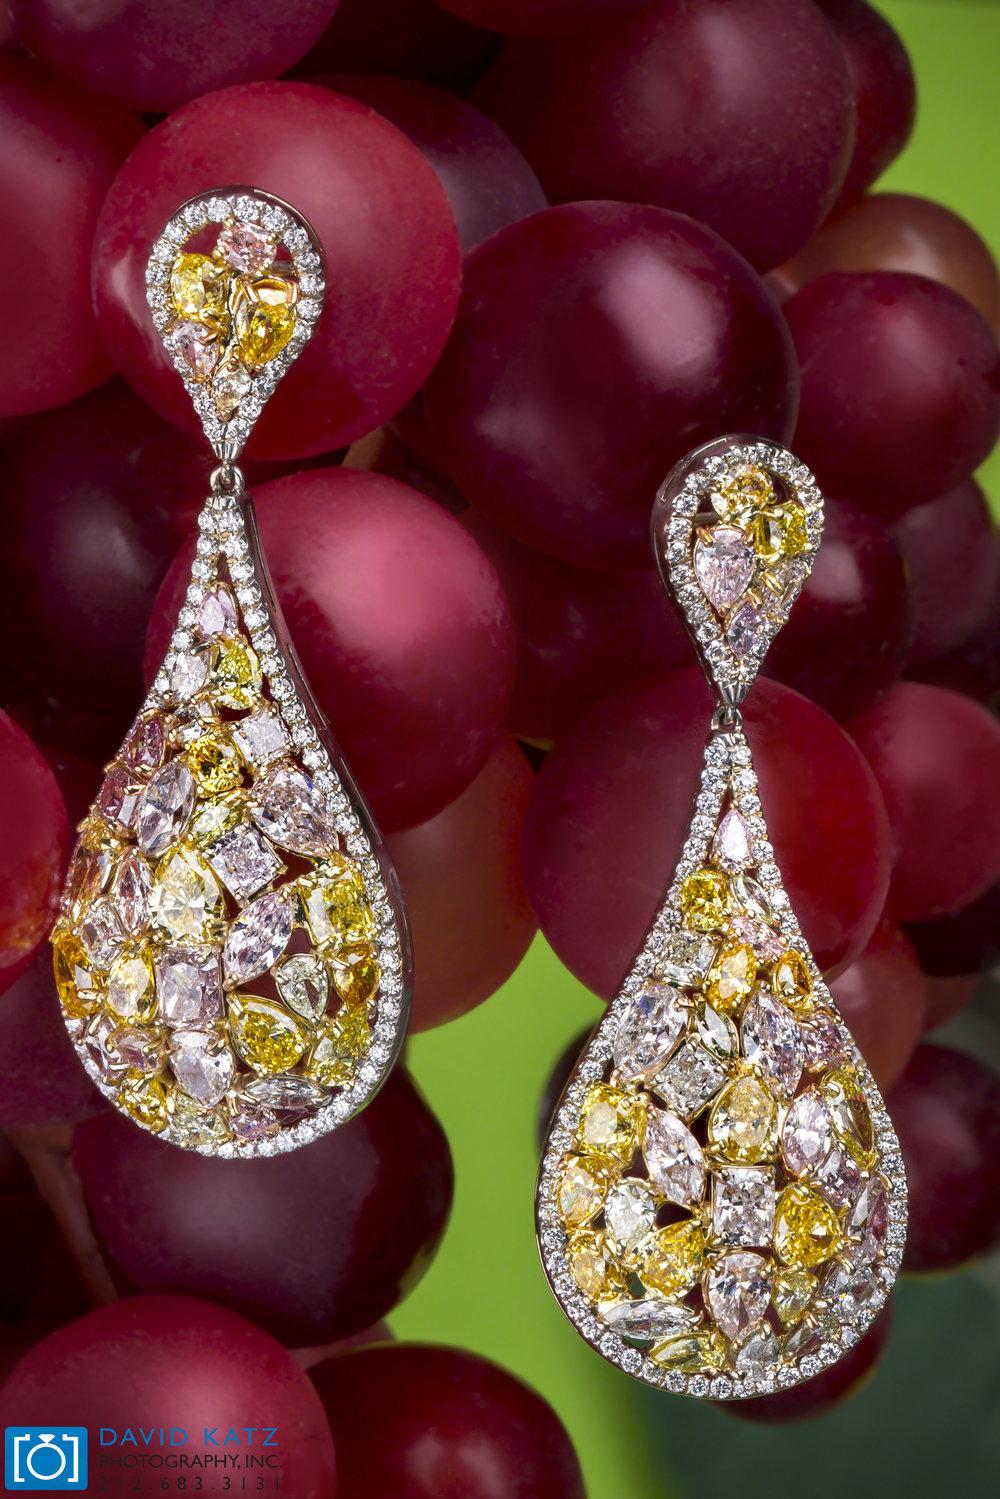 Mixed Cut Color Diamond Earrings Lifestlye_NEWLOGO.jpg